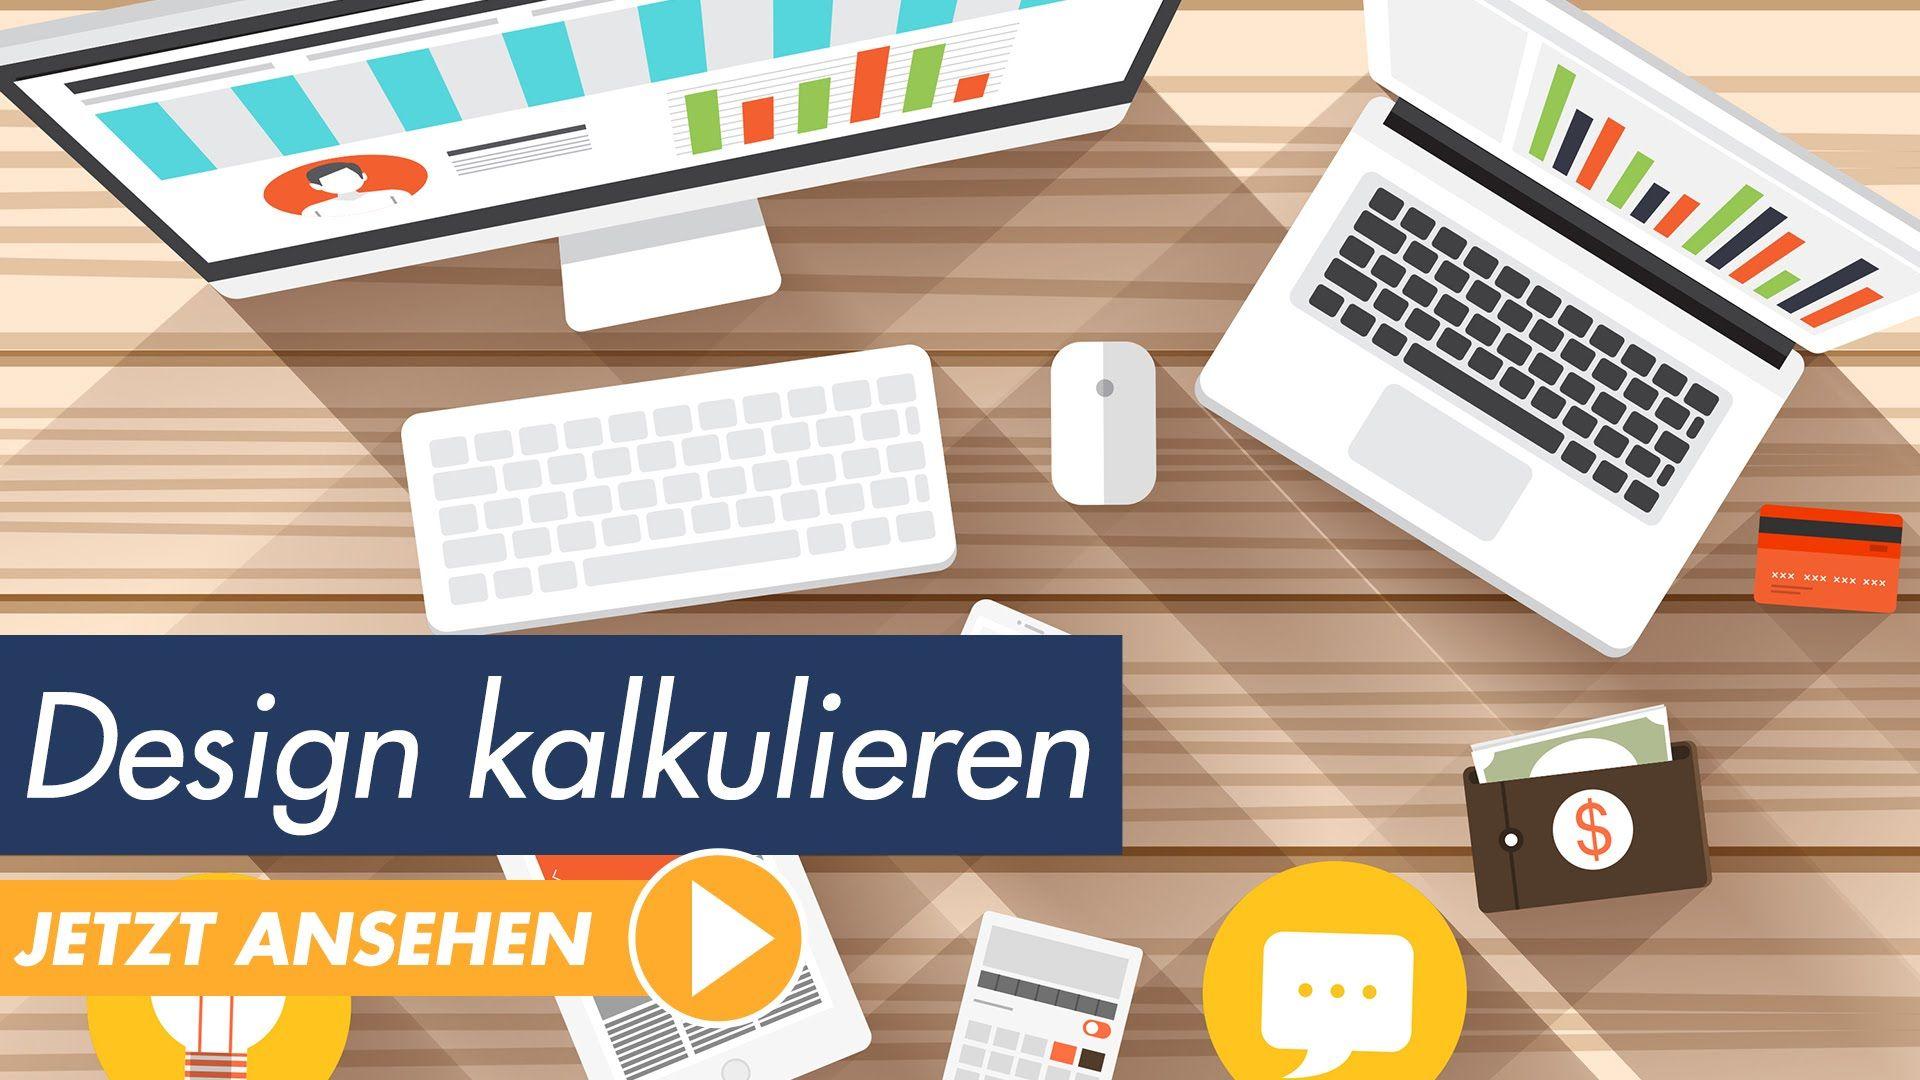 Facebook Bildgrossen Neues Seiten Design Infografik Guide Anleitung Pixelgrossen 2017 Offentlichkeitsarbeit Infografik Bildgrossen